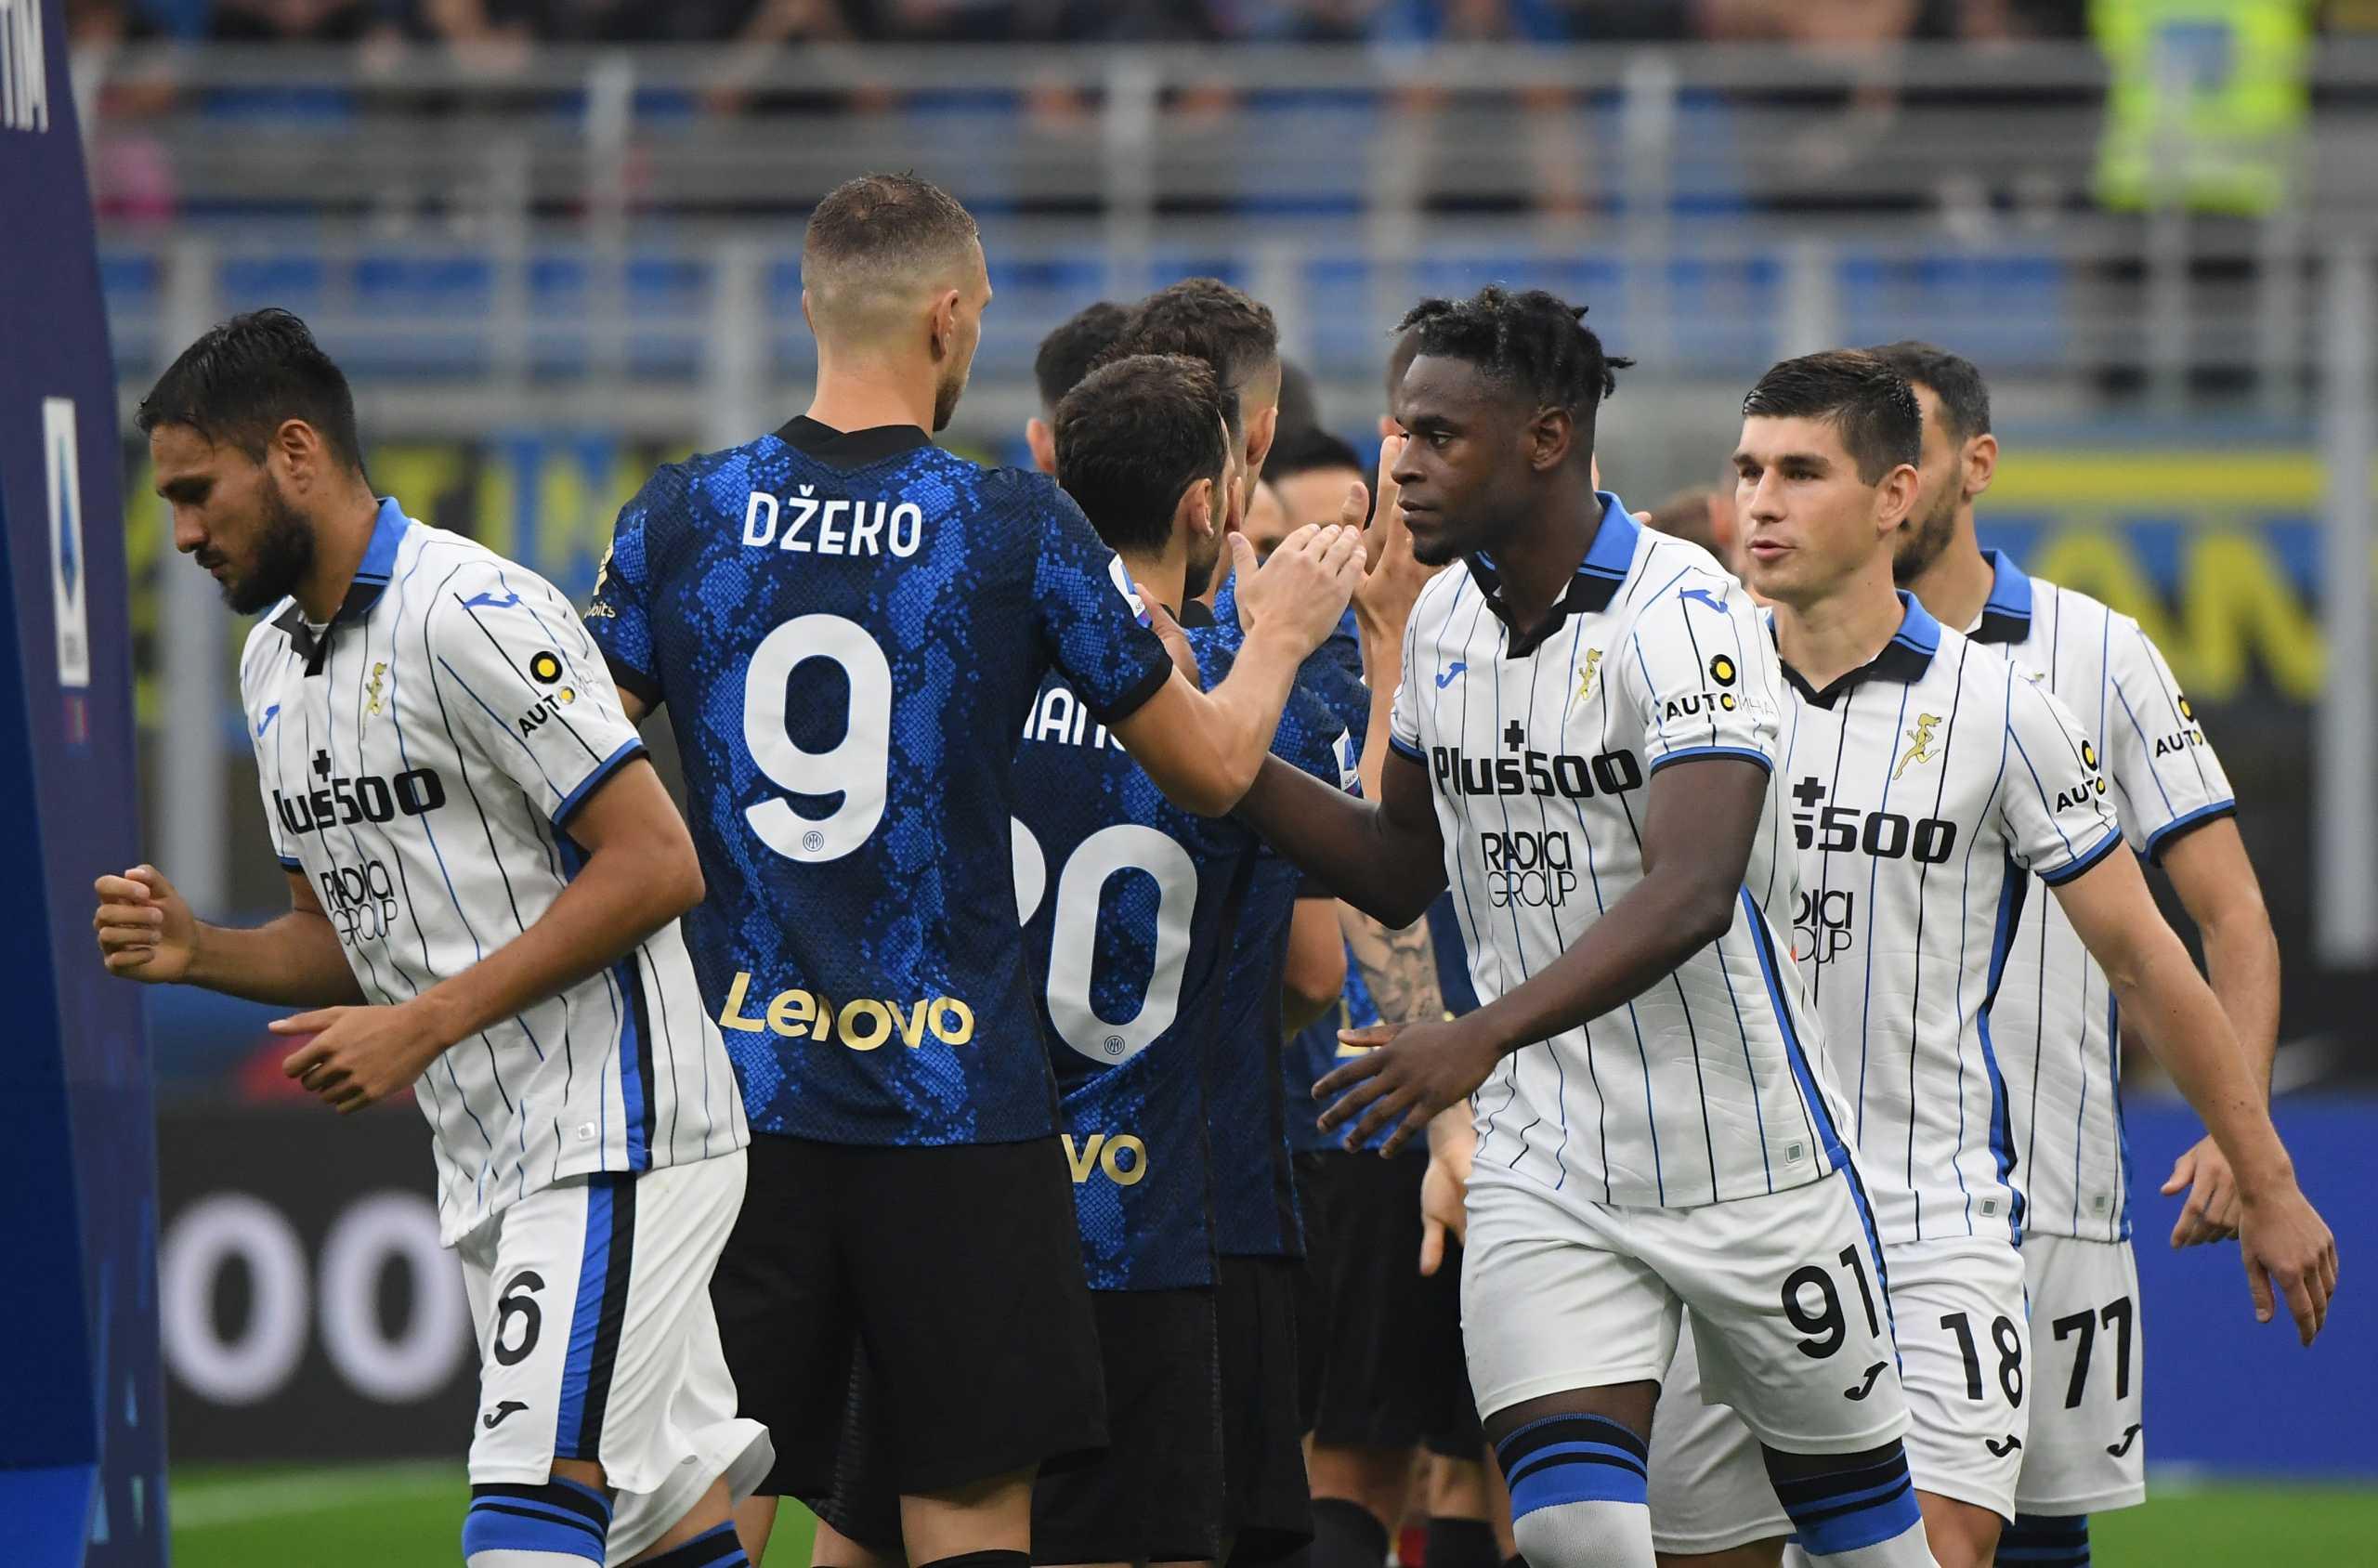 Serie A, Ίντερ – Αταλάντα 2-2: «Τρελό» φινάλε στο Μιλάνο